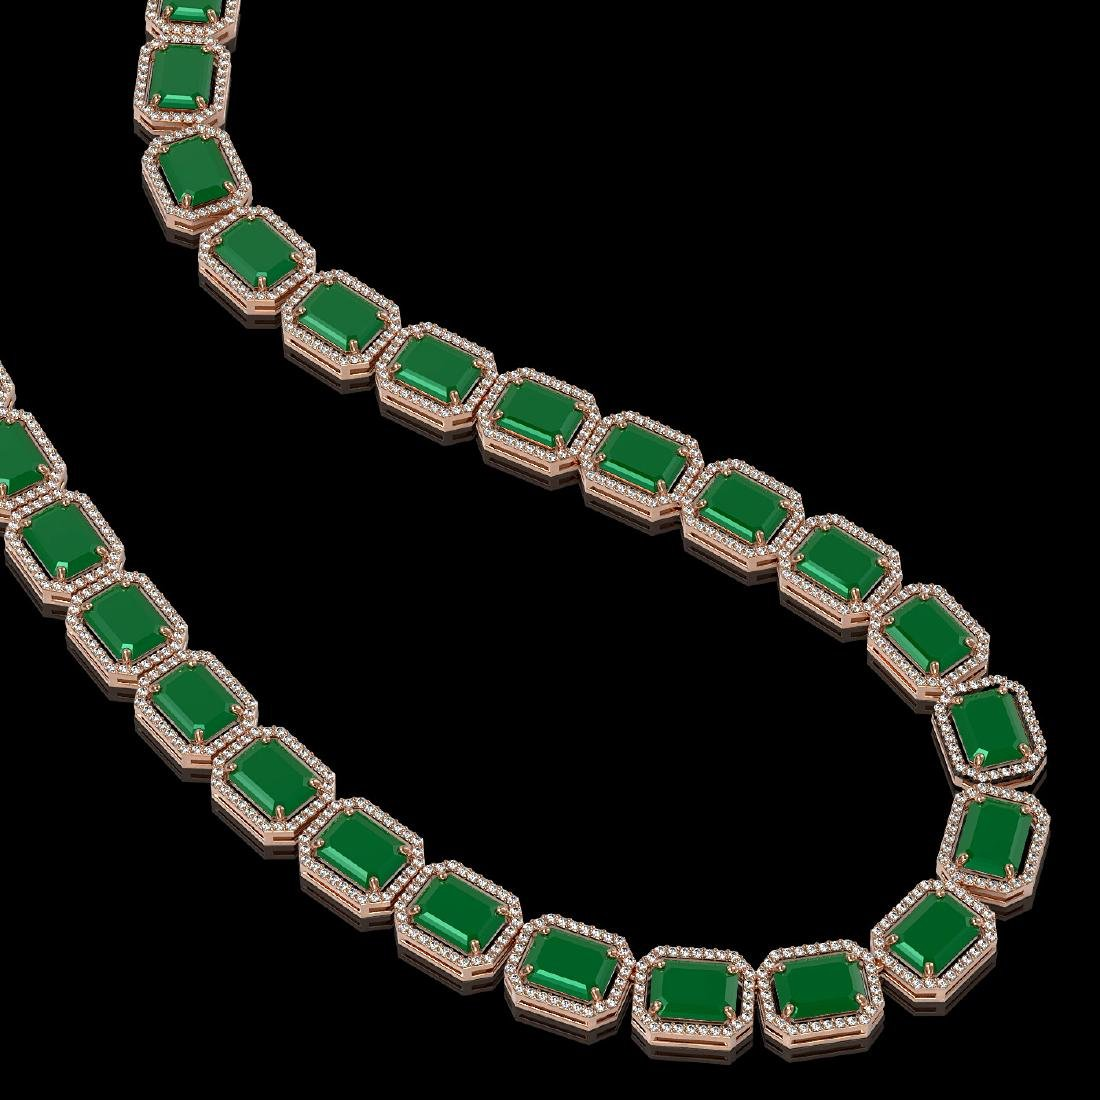 84.94 CTW Emerald & Diamond Halo Necklace 10K Rose Gold - 2